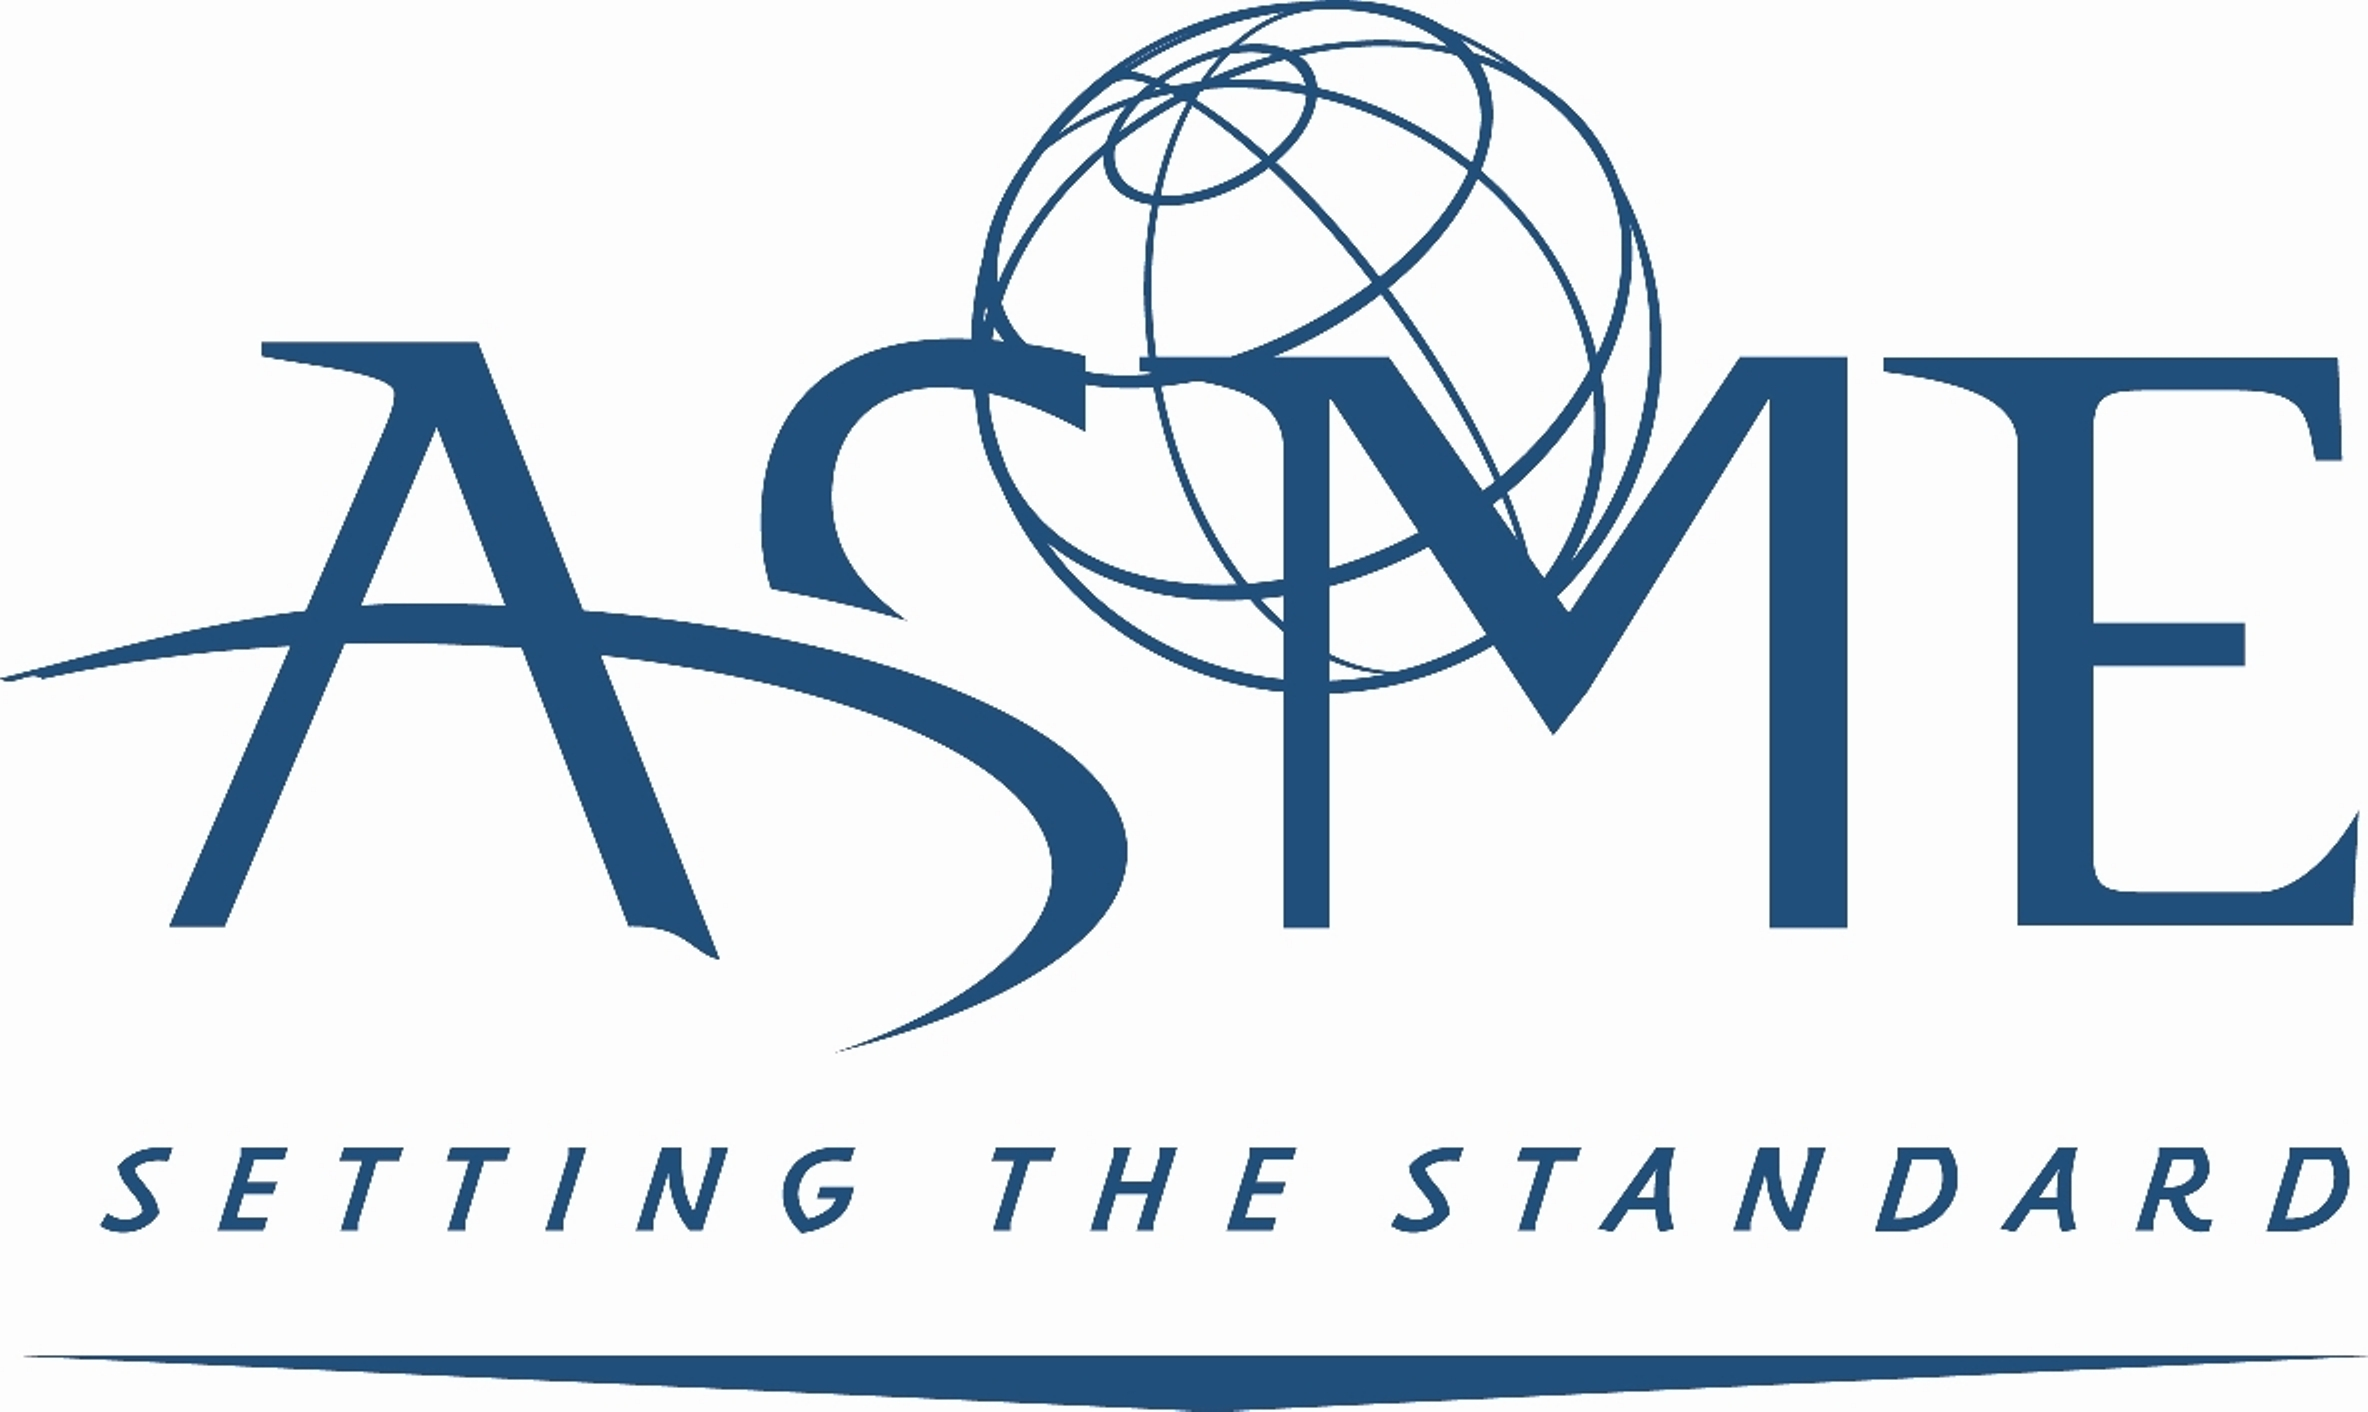 asme-logo_blue-pms661.jpg